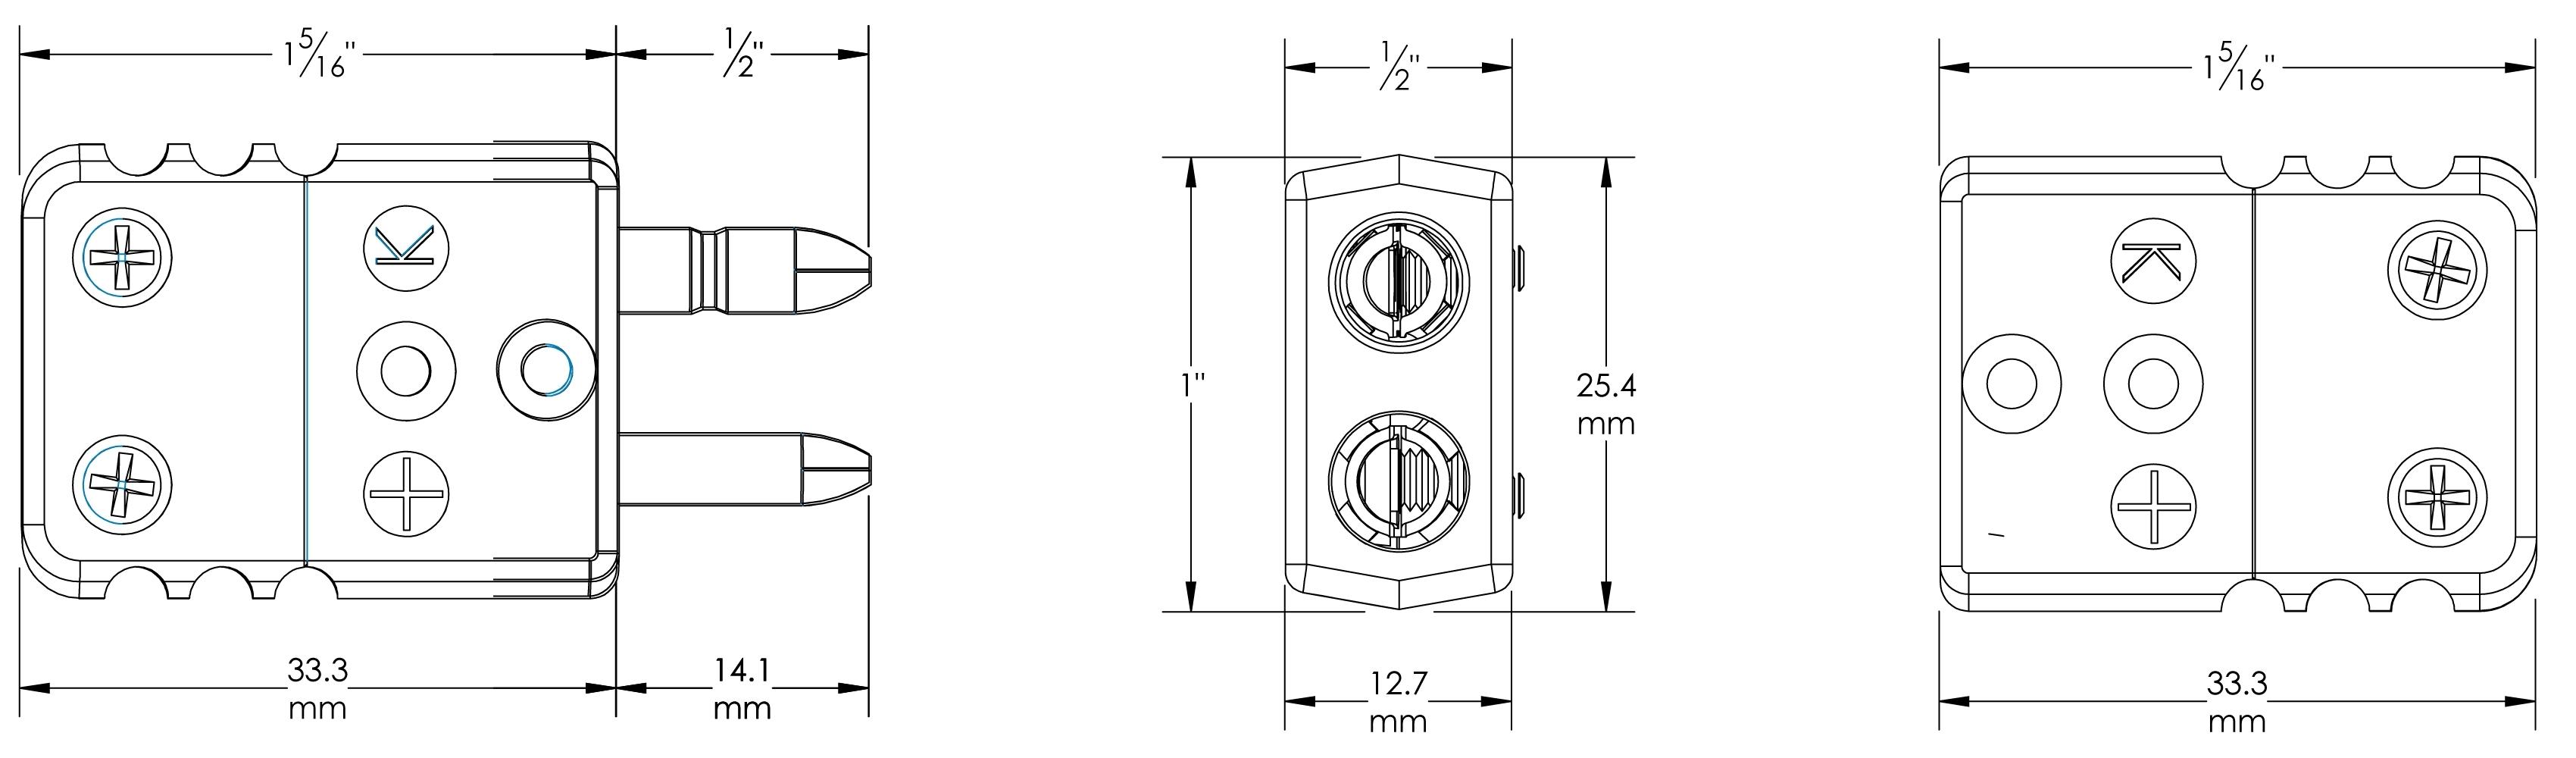 high-resolution-dimensions-2-pole-standard.jpg